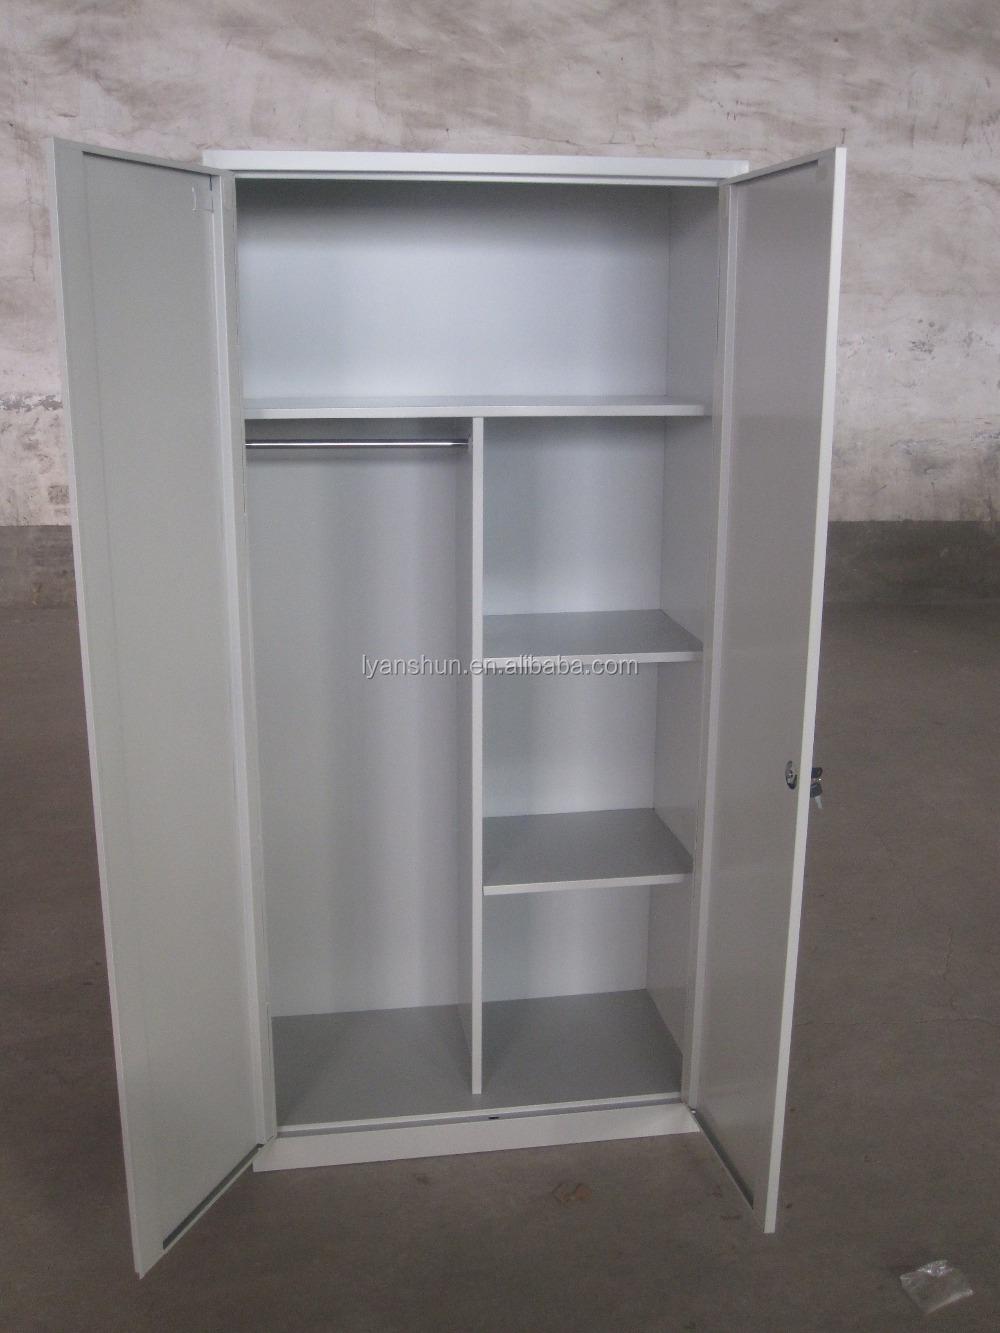 2 door steel cloth cabinet wardrobe metal closet clothes for Cloth cabinet design